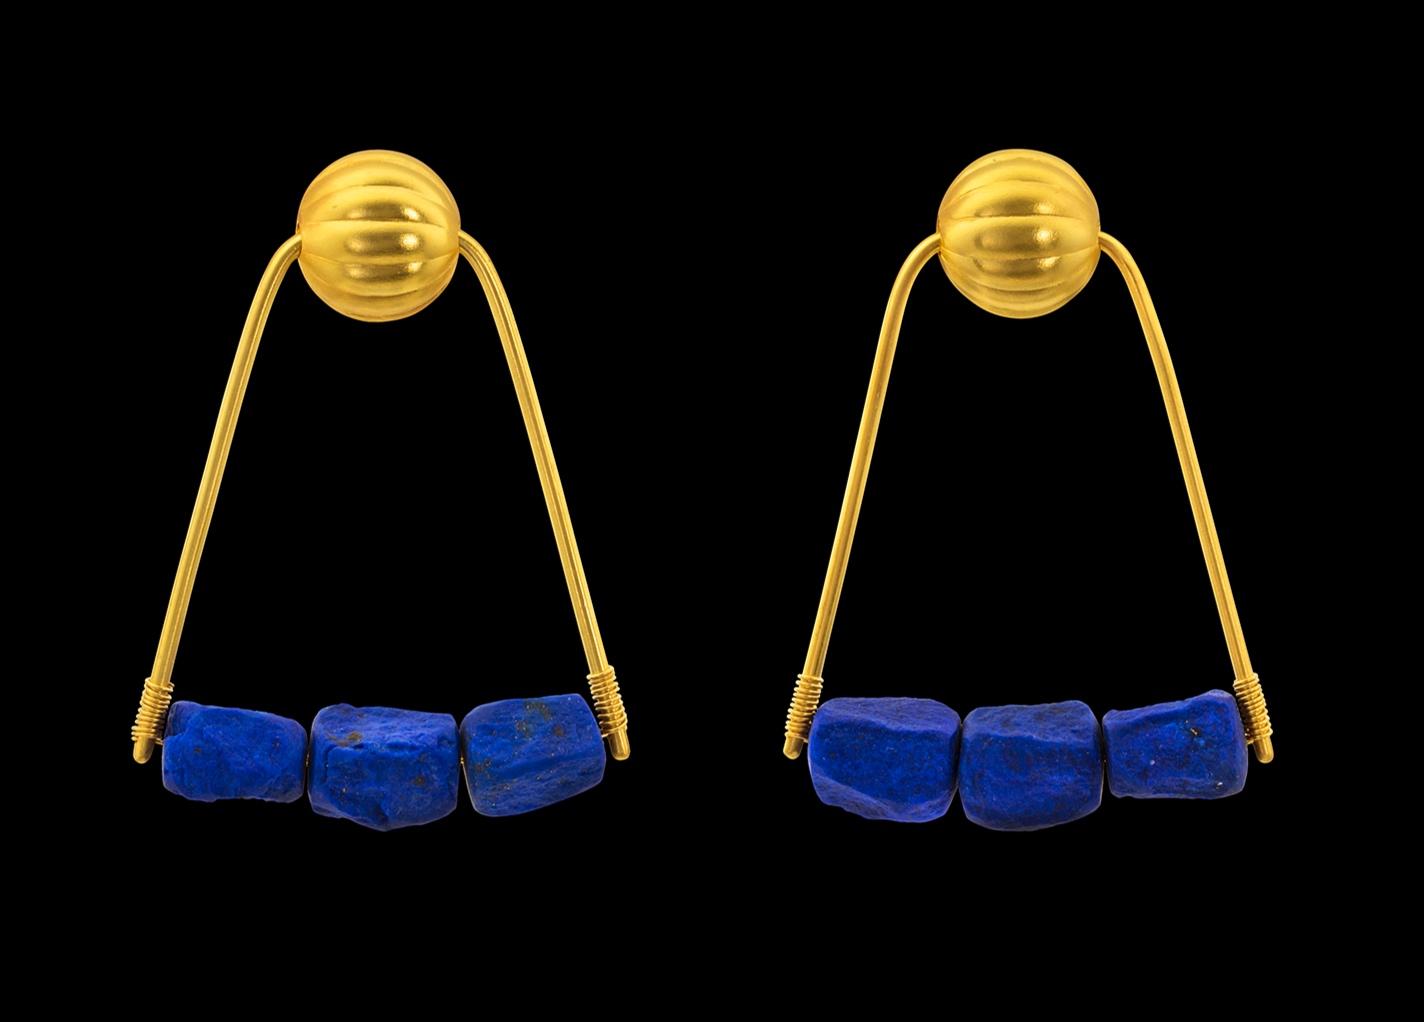 21ST DYNASTY EAR ORNAMENT 22k yellow gold, lapis